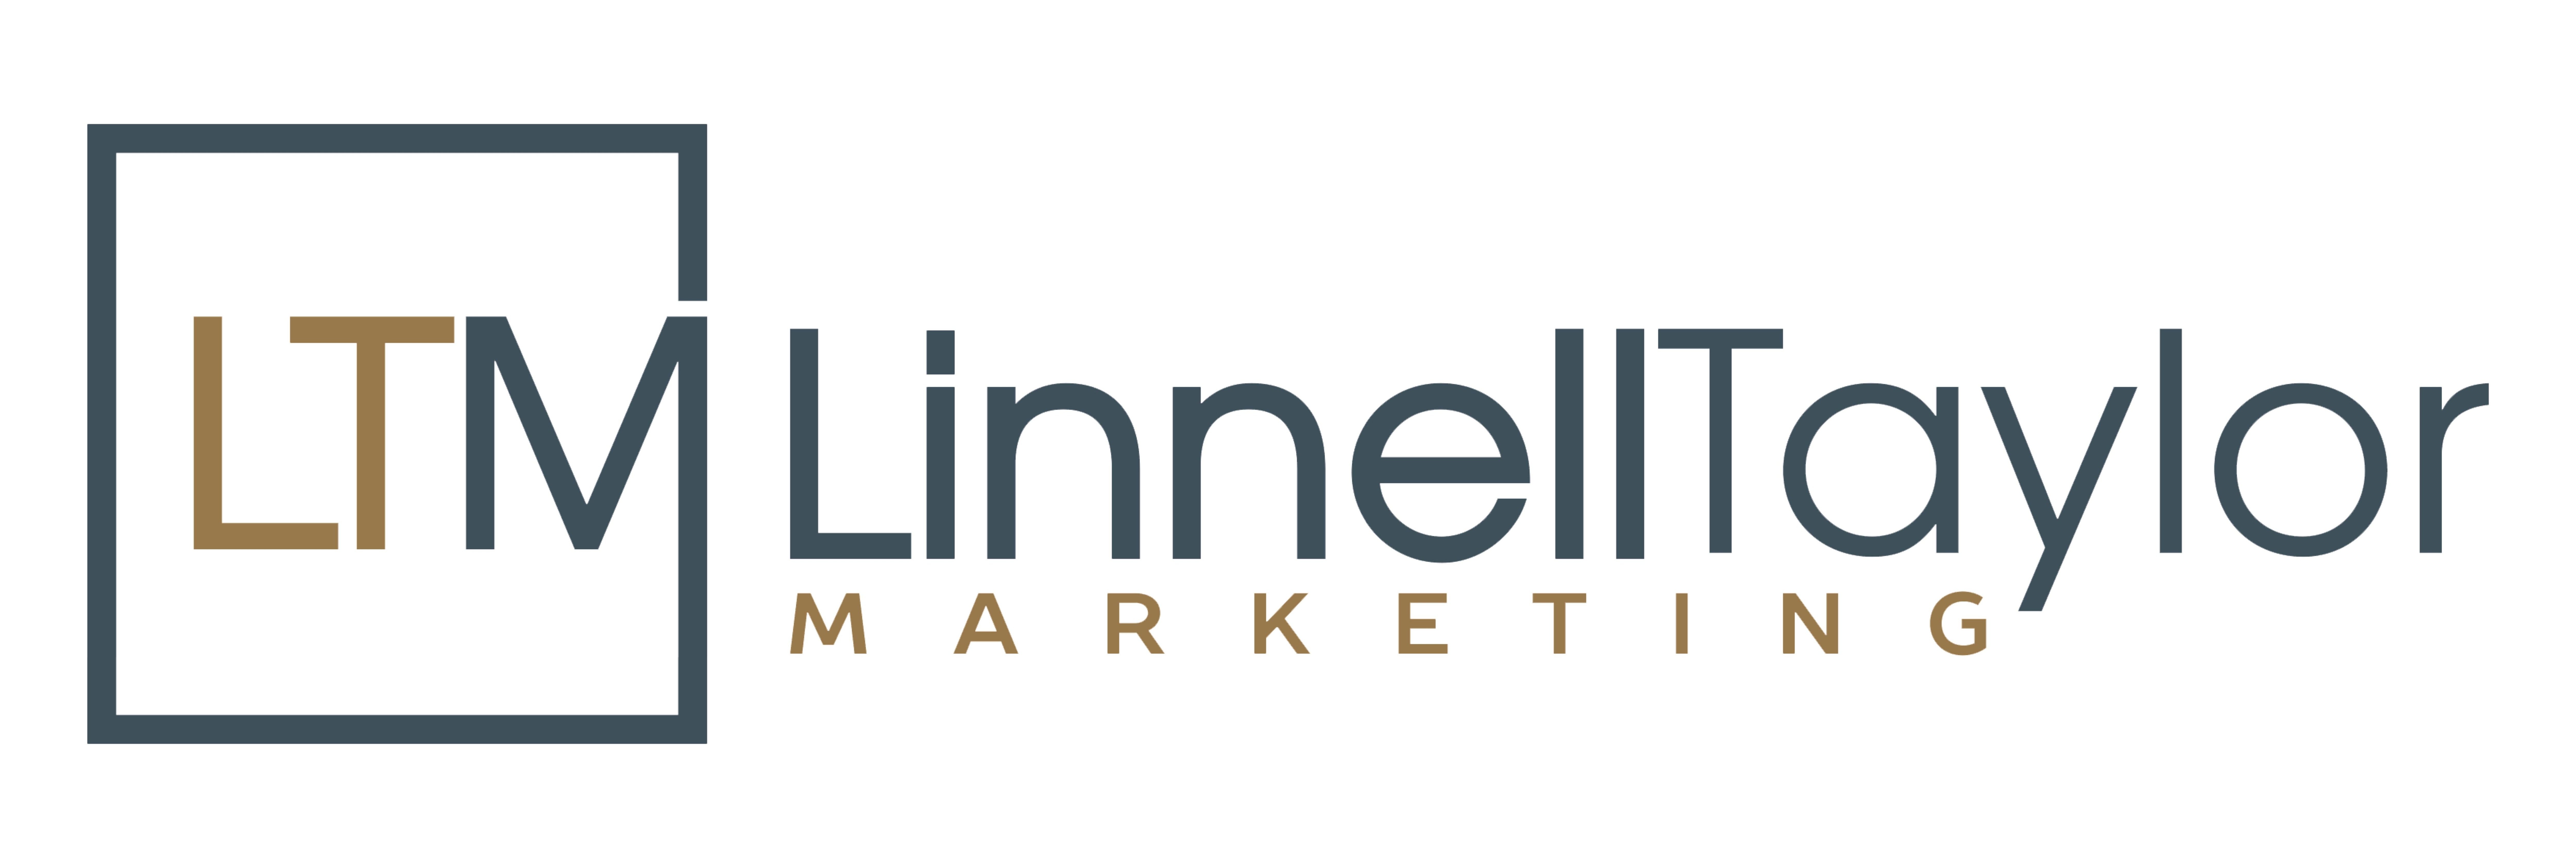 Full Size LTM Logo_transparent